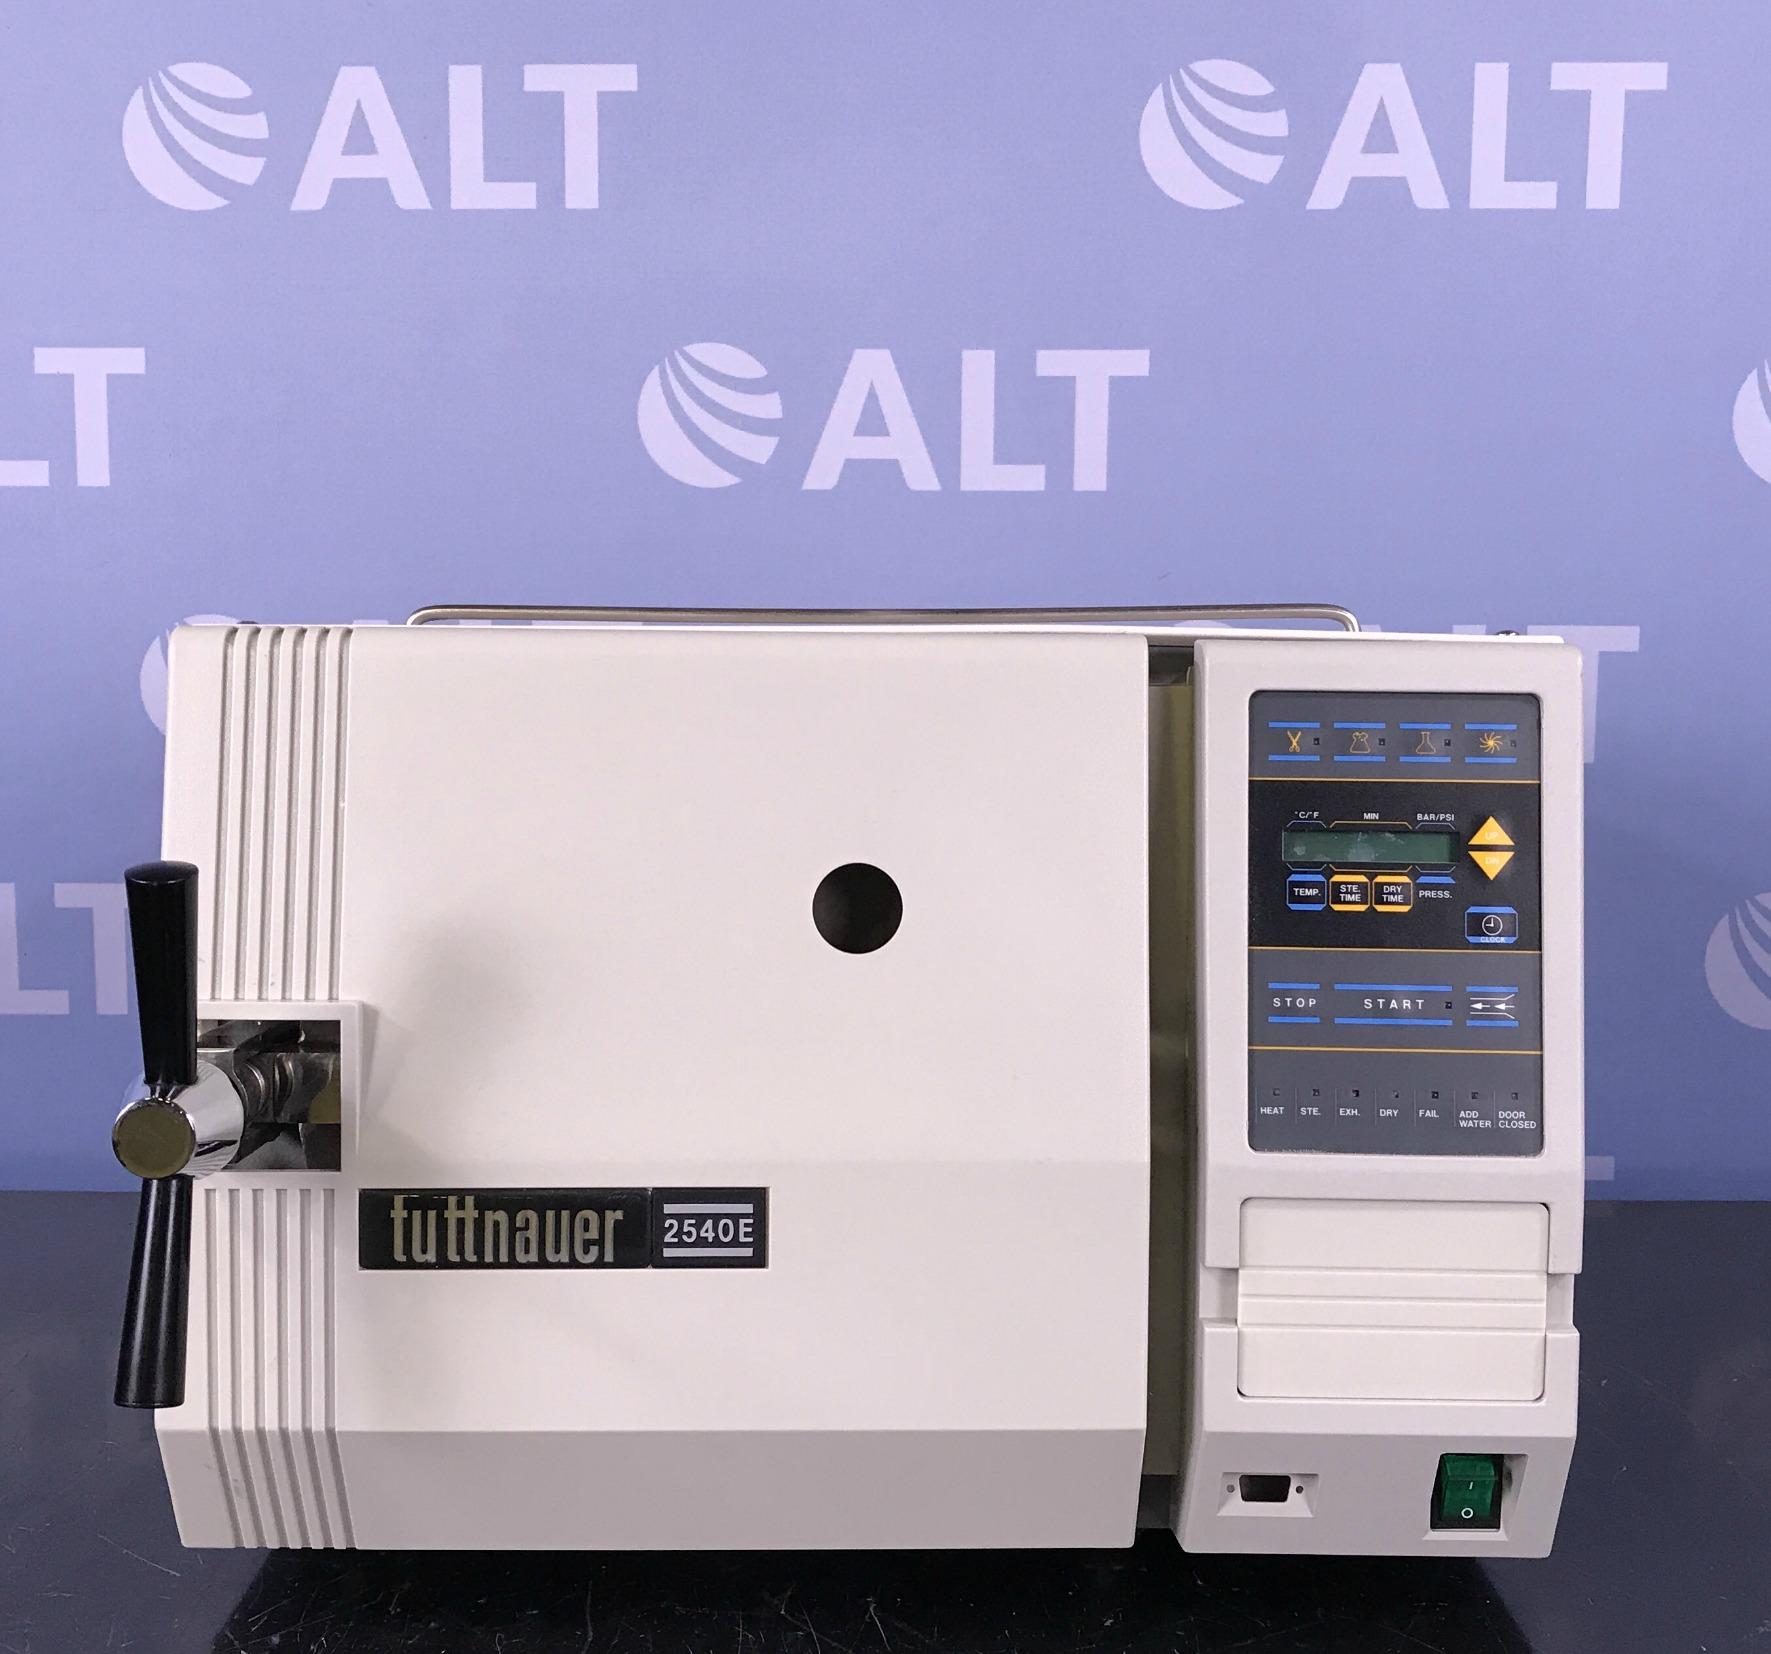 Tuttnauer 2540E Tabletop Digital Autoclave Image